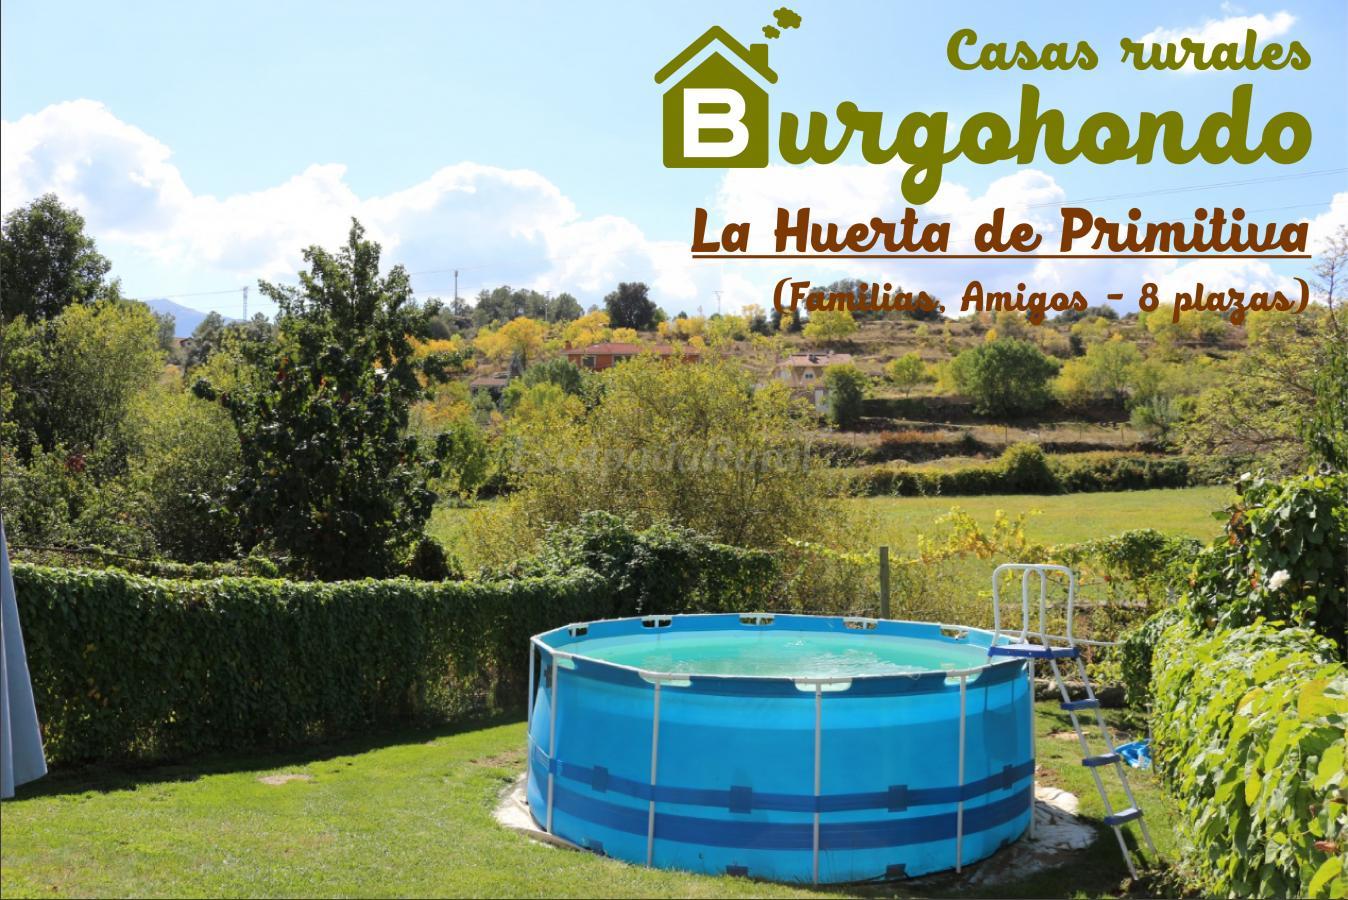 Fotos de la huerta de primitiva casa rural en burgohondo vila - Casas rurales la huerta ...